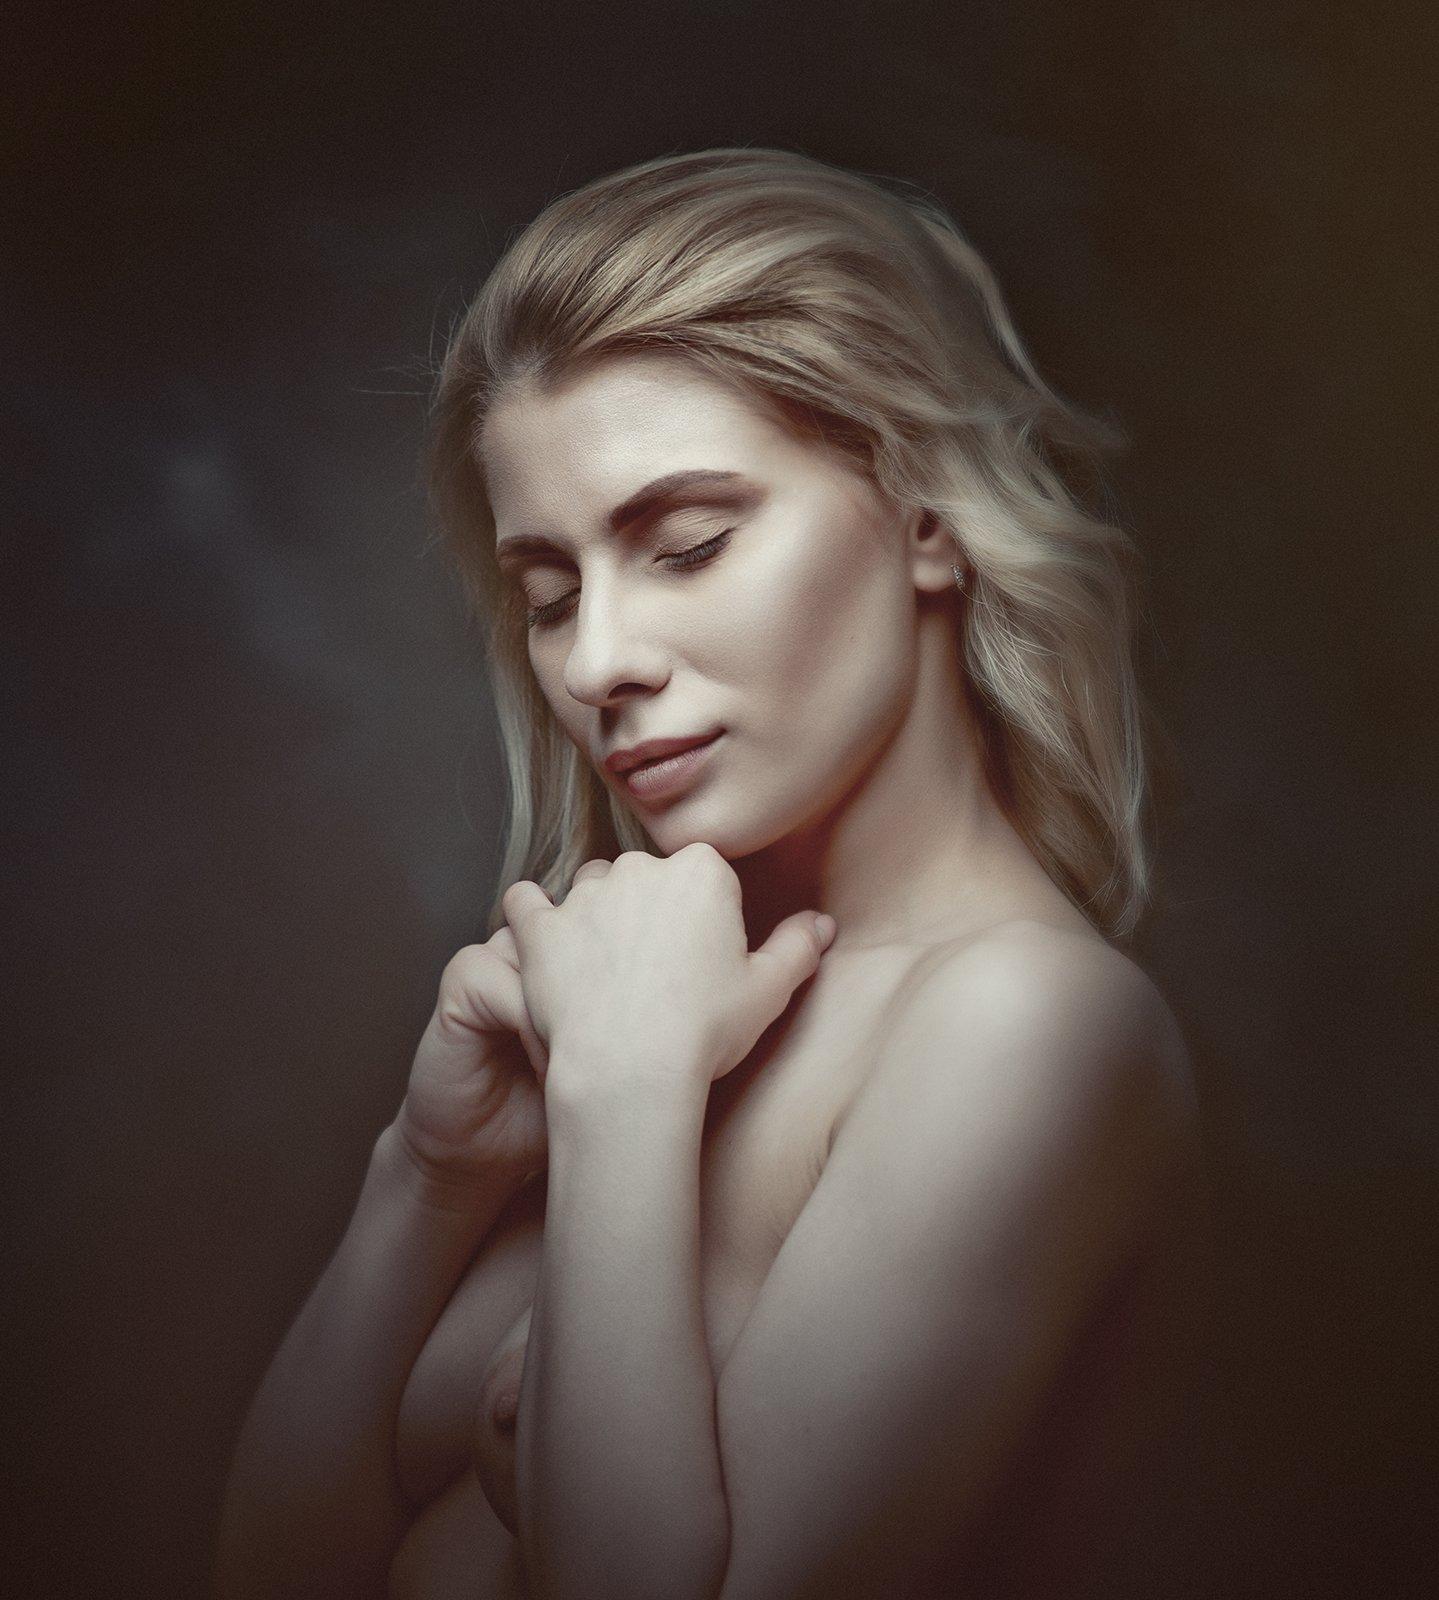 blonde, female, beauty, portrait, nude, naked, sensual, sensuality, feminine, woman, adult, adorable, mood, people, Дмитрий Толоконов